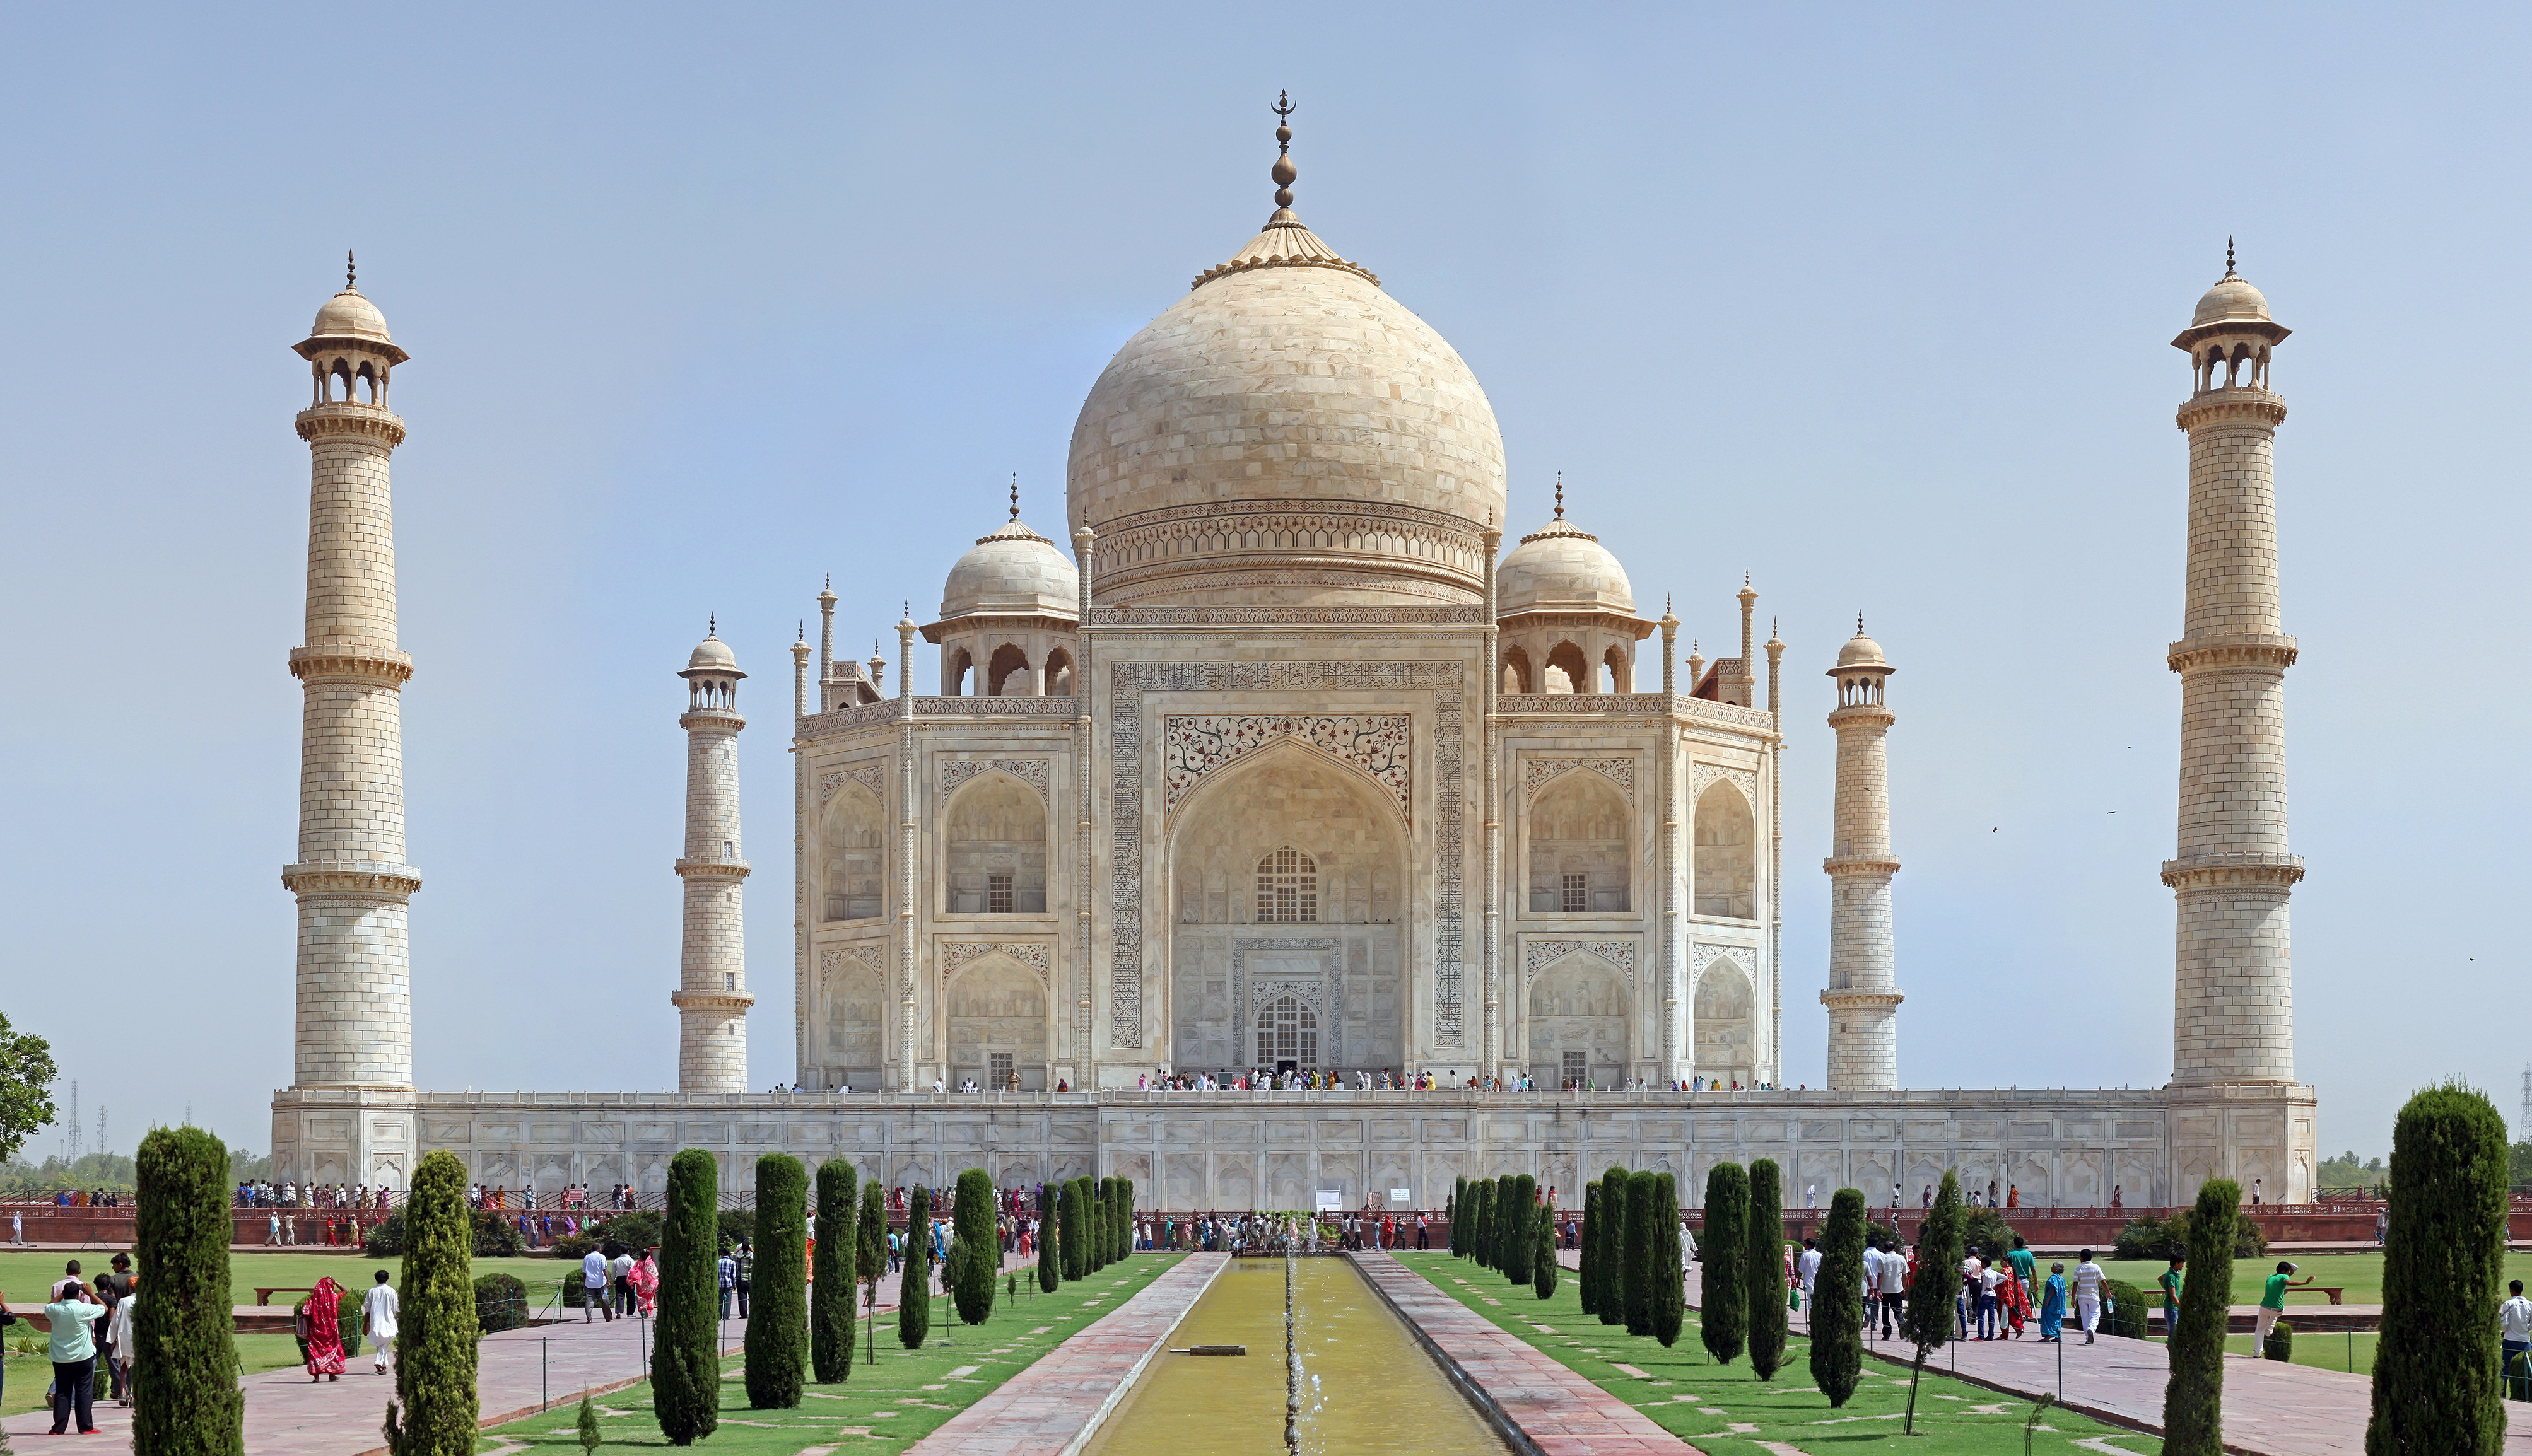 Nice wallpapers Taj Mahal 4014x2309px